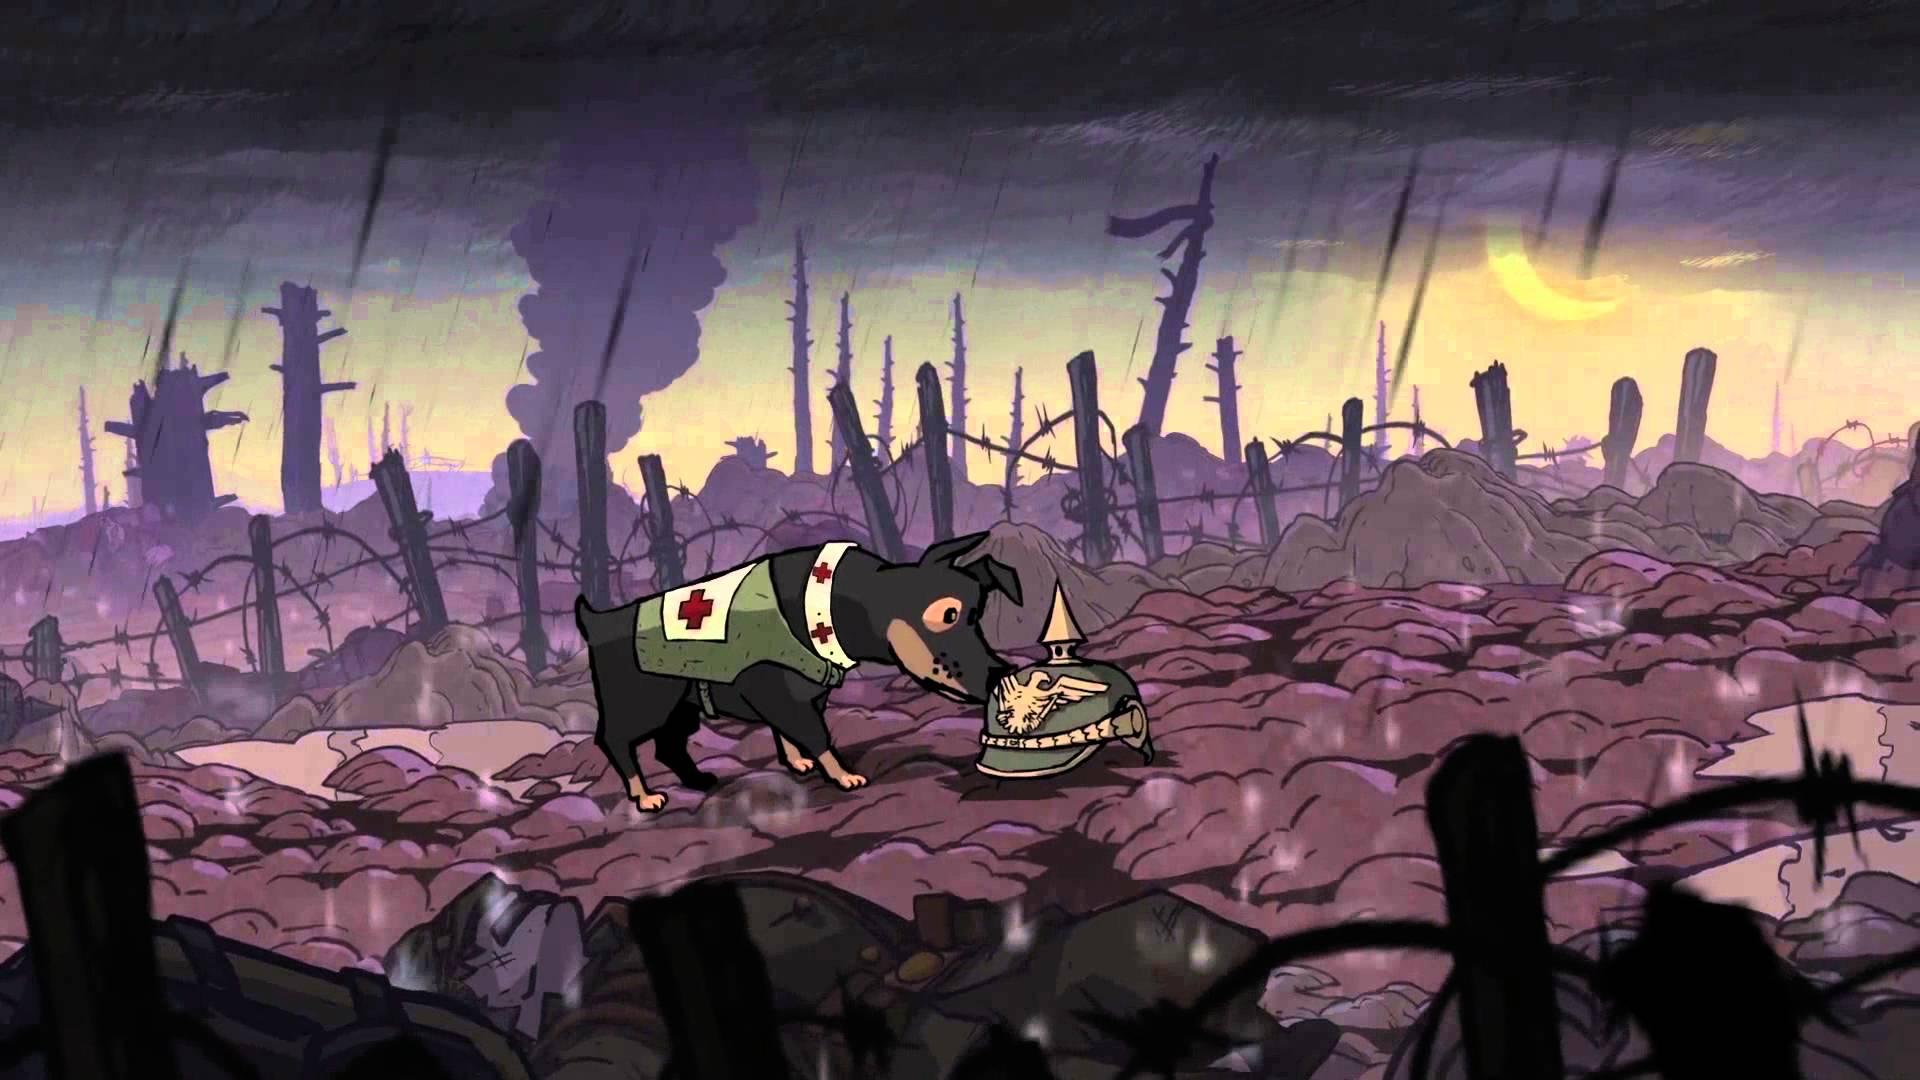 Valiant Hearts llega remasterizado para nintendo switch